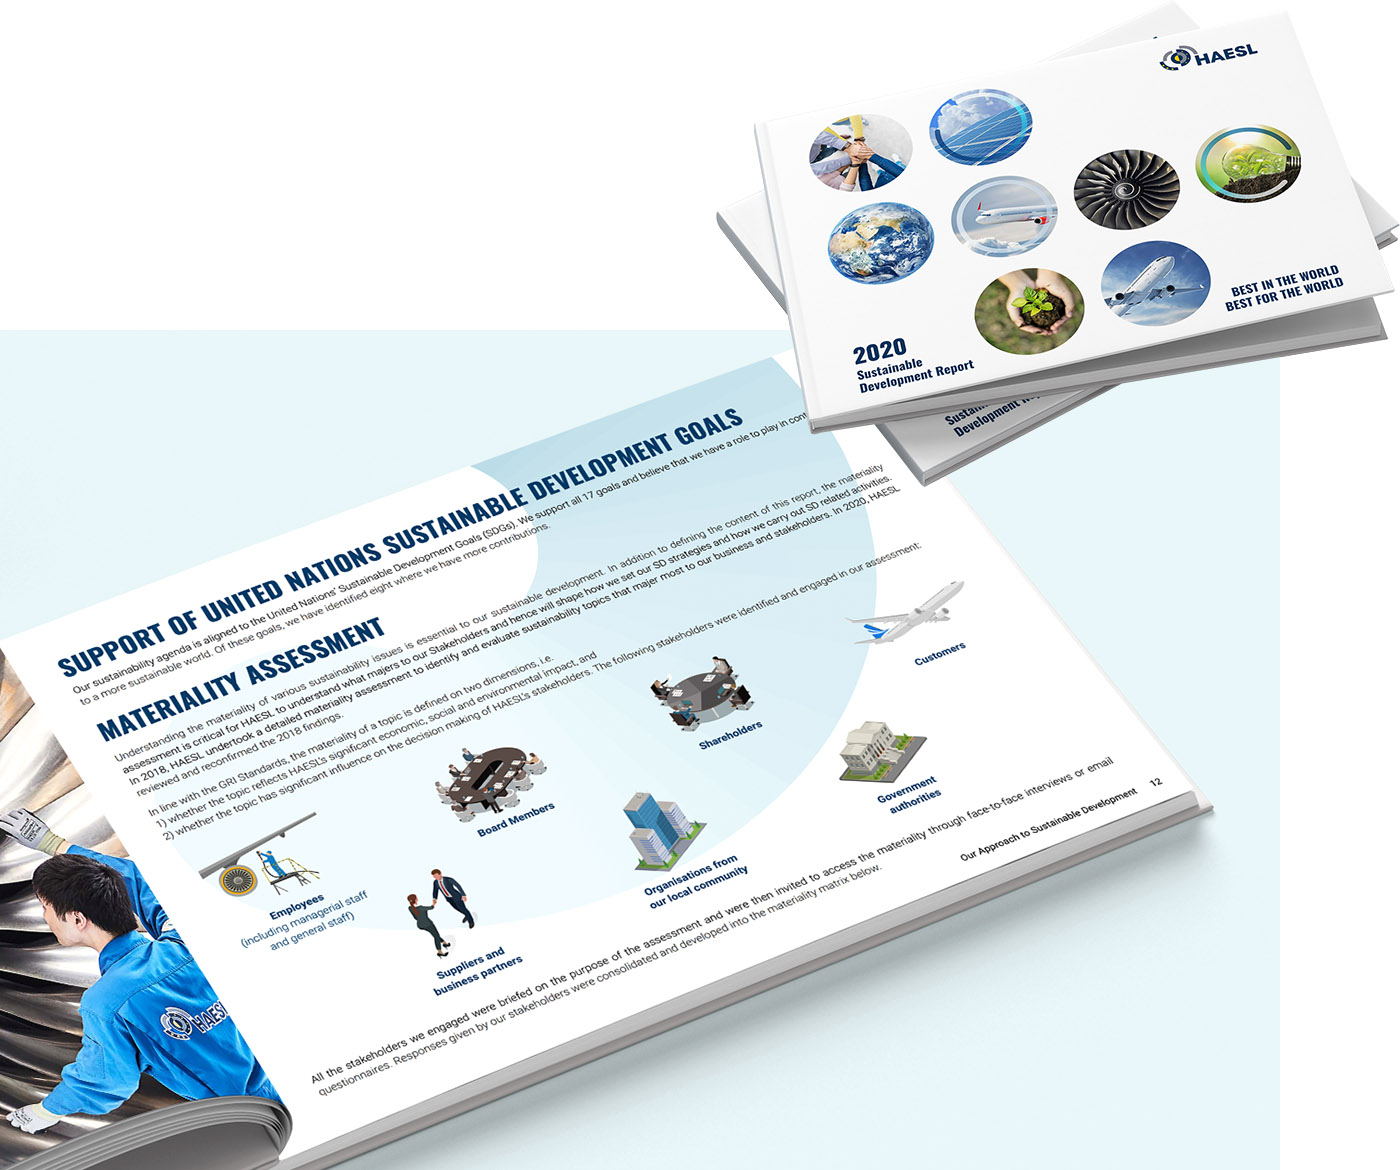 Hong Kong Aero Engine Services Limited (HAESL) 2020